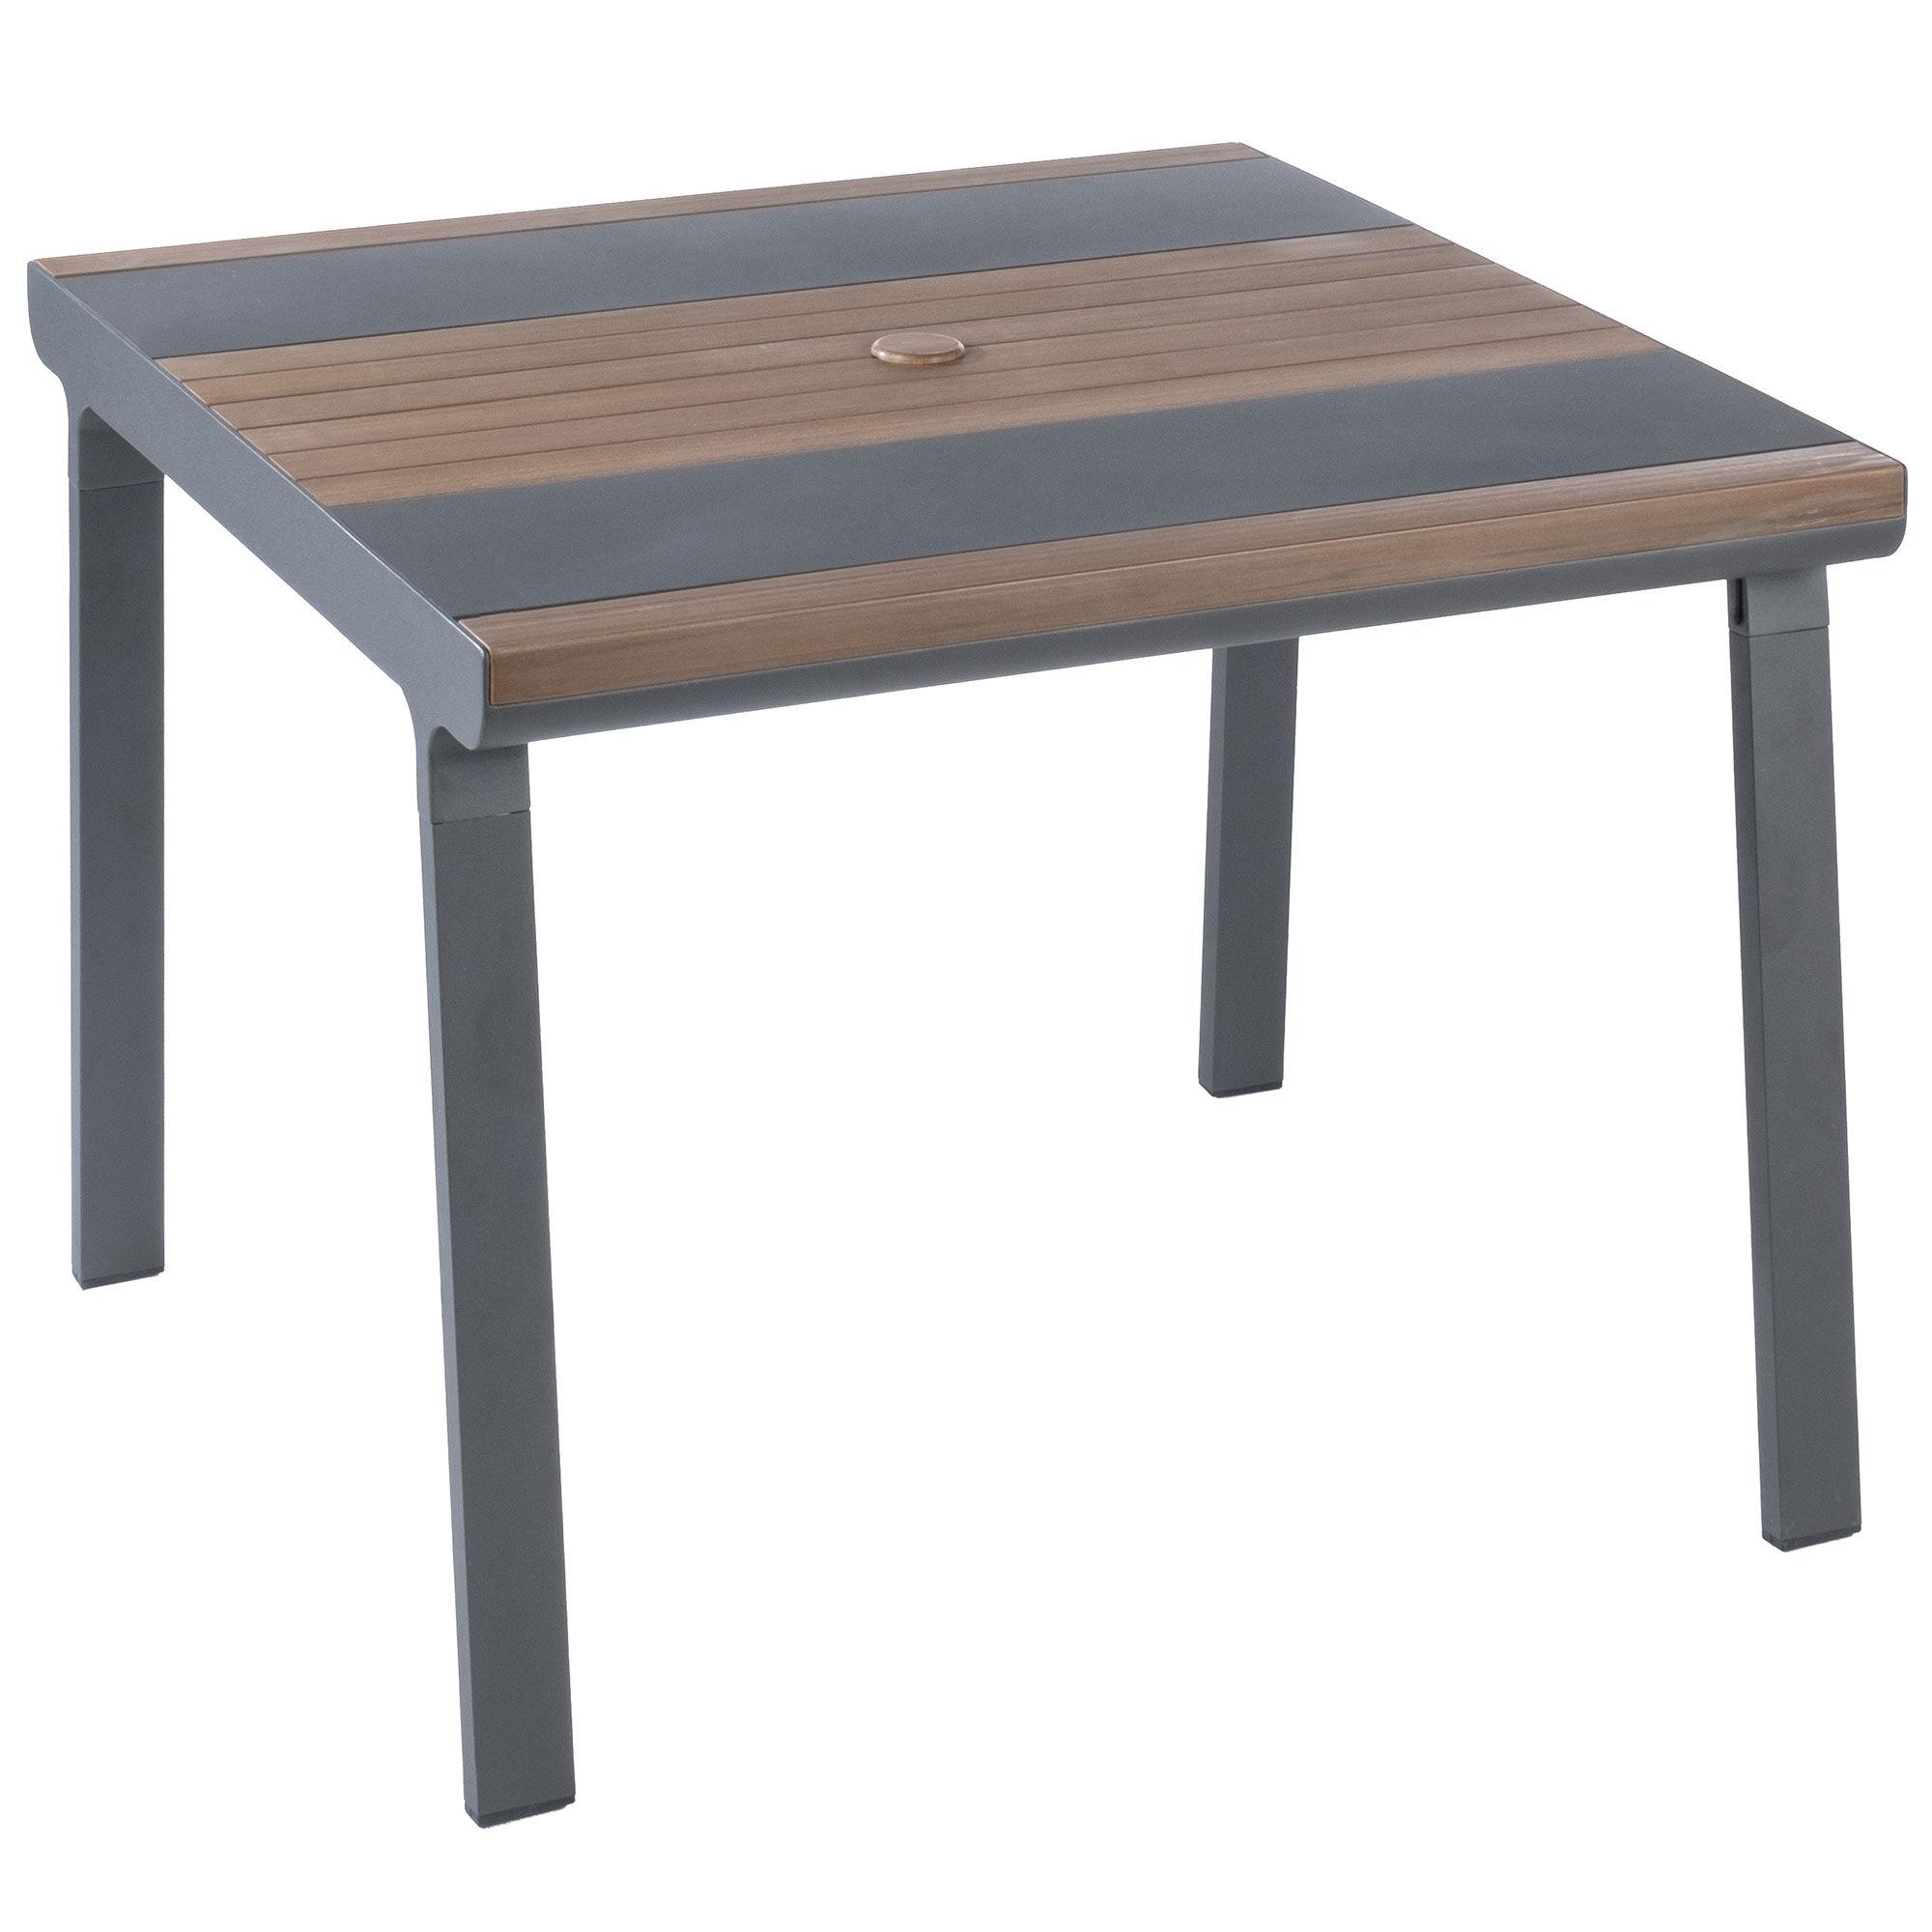 "Alfresco Home Copenhagen 40"" Square Dining Table  - Aluminum - Size: One Size"